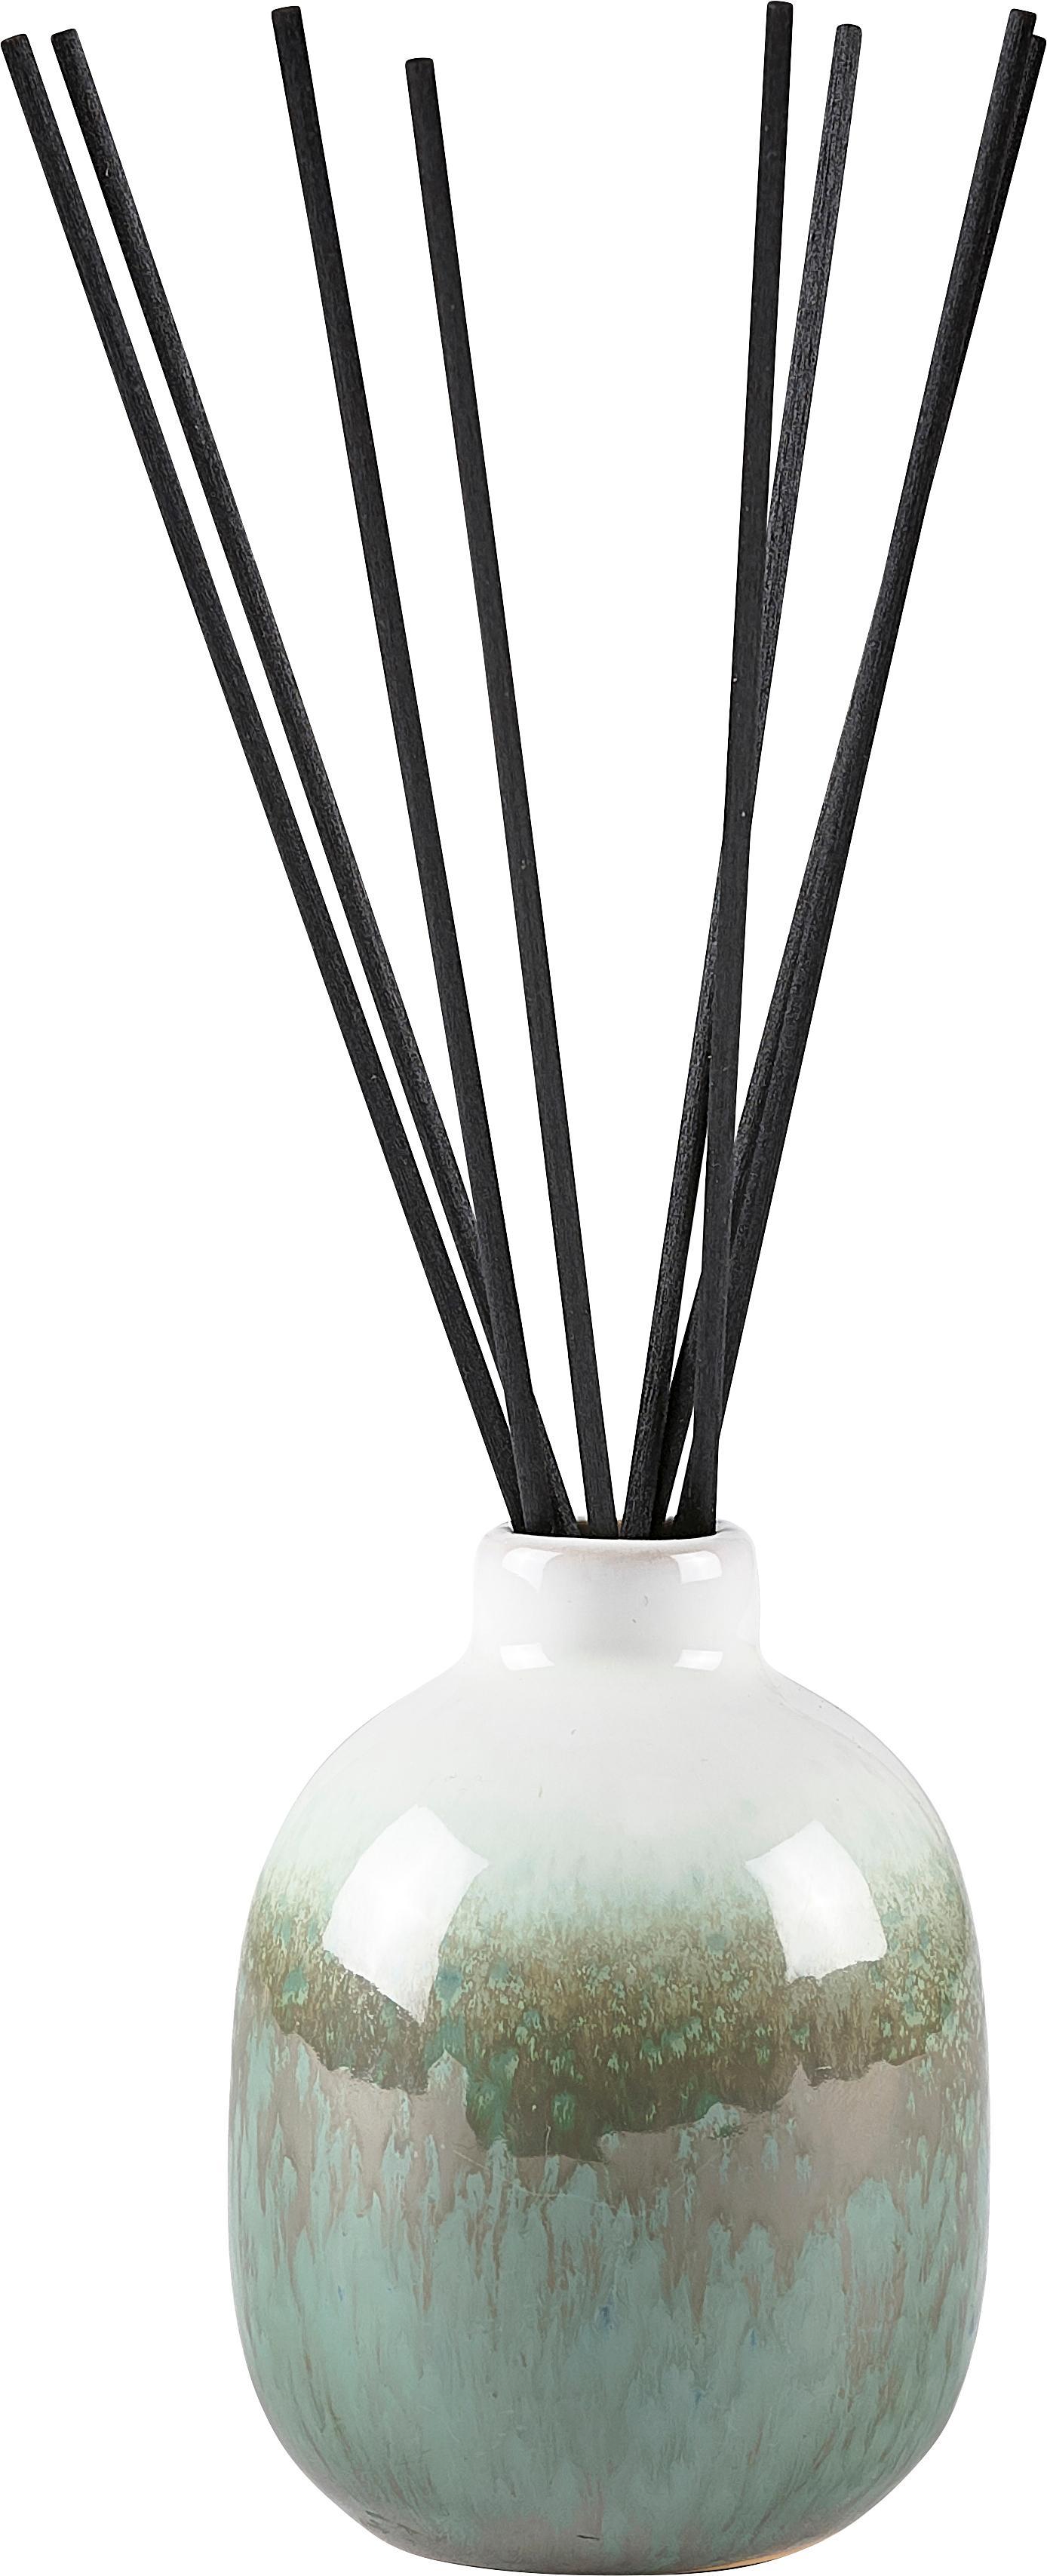 Diffuser Cactus Blossom, Behälter: Keramik, Grüntöne, Beige, Weiss, Ø 7 x H 10 cm